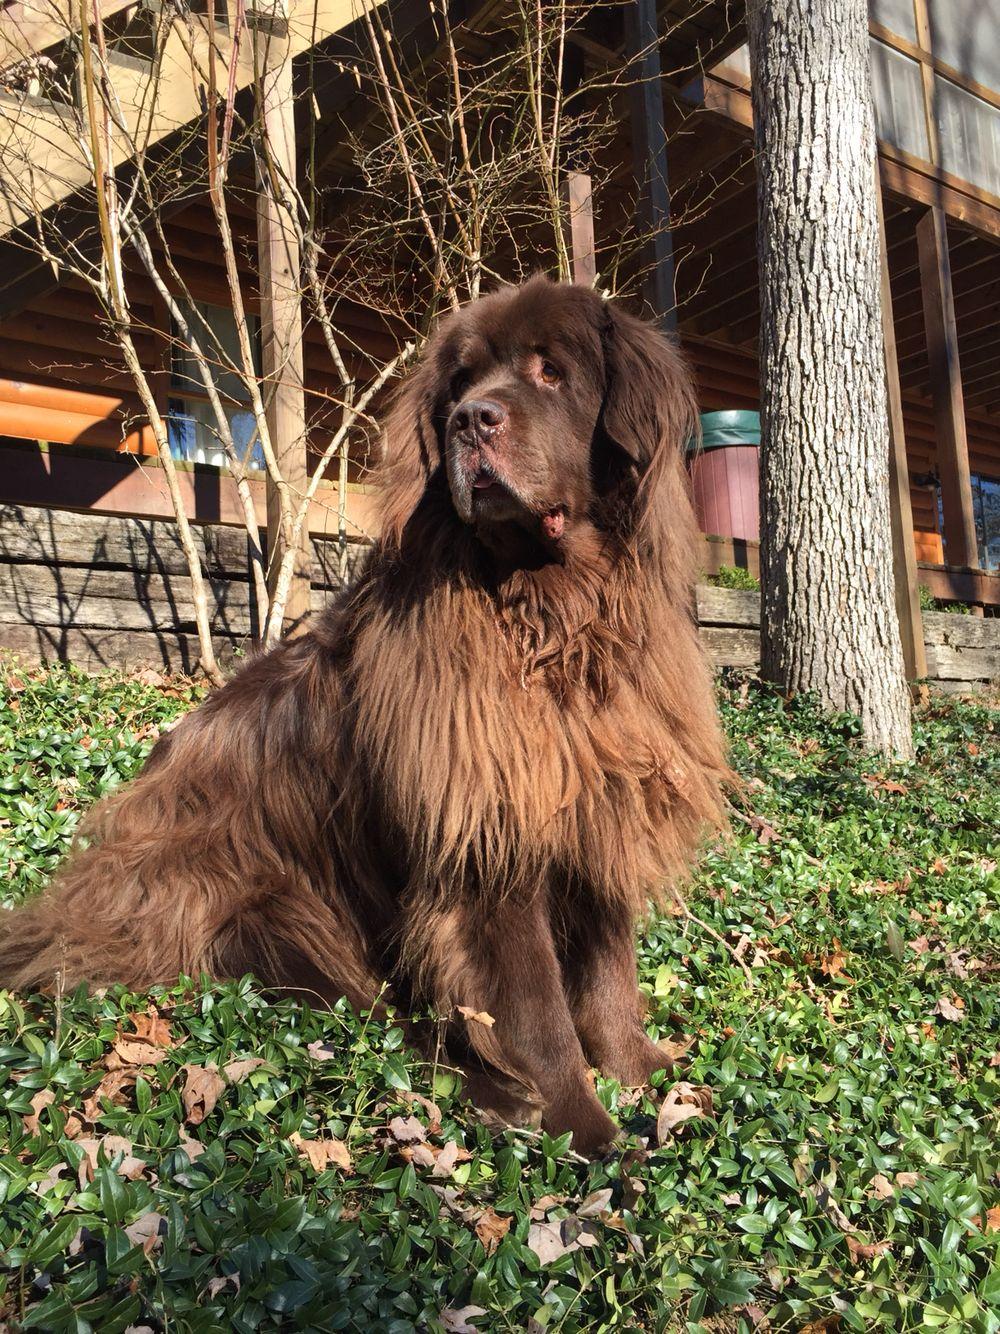 Zeus, our Newfoundland dog, out enjoying the sunshine and